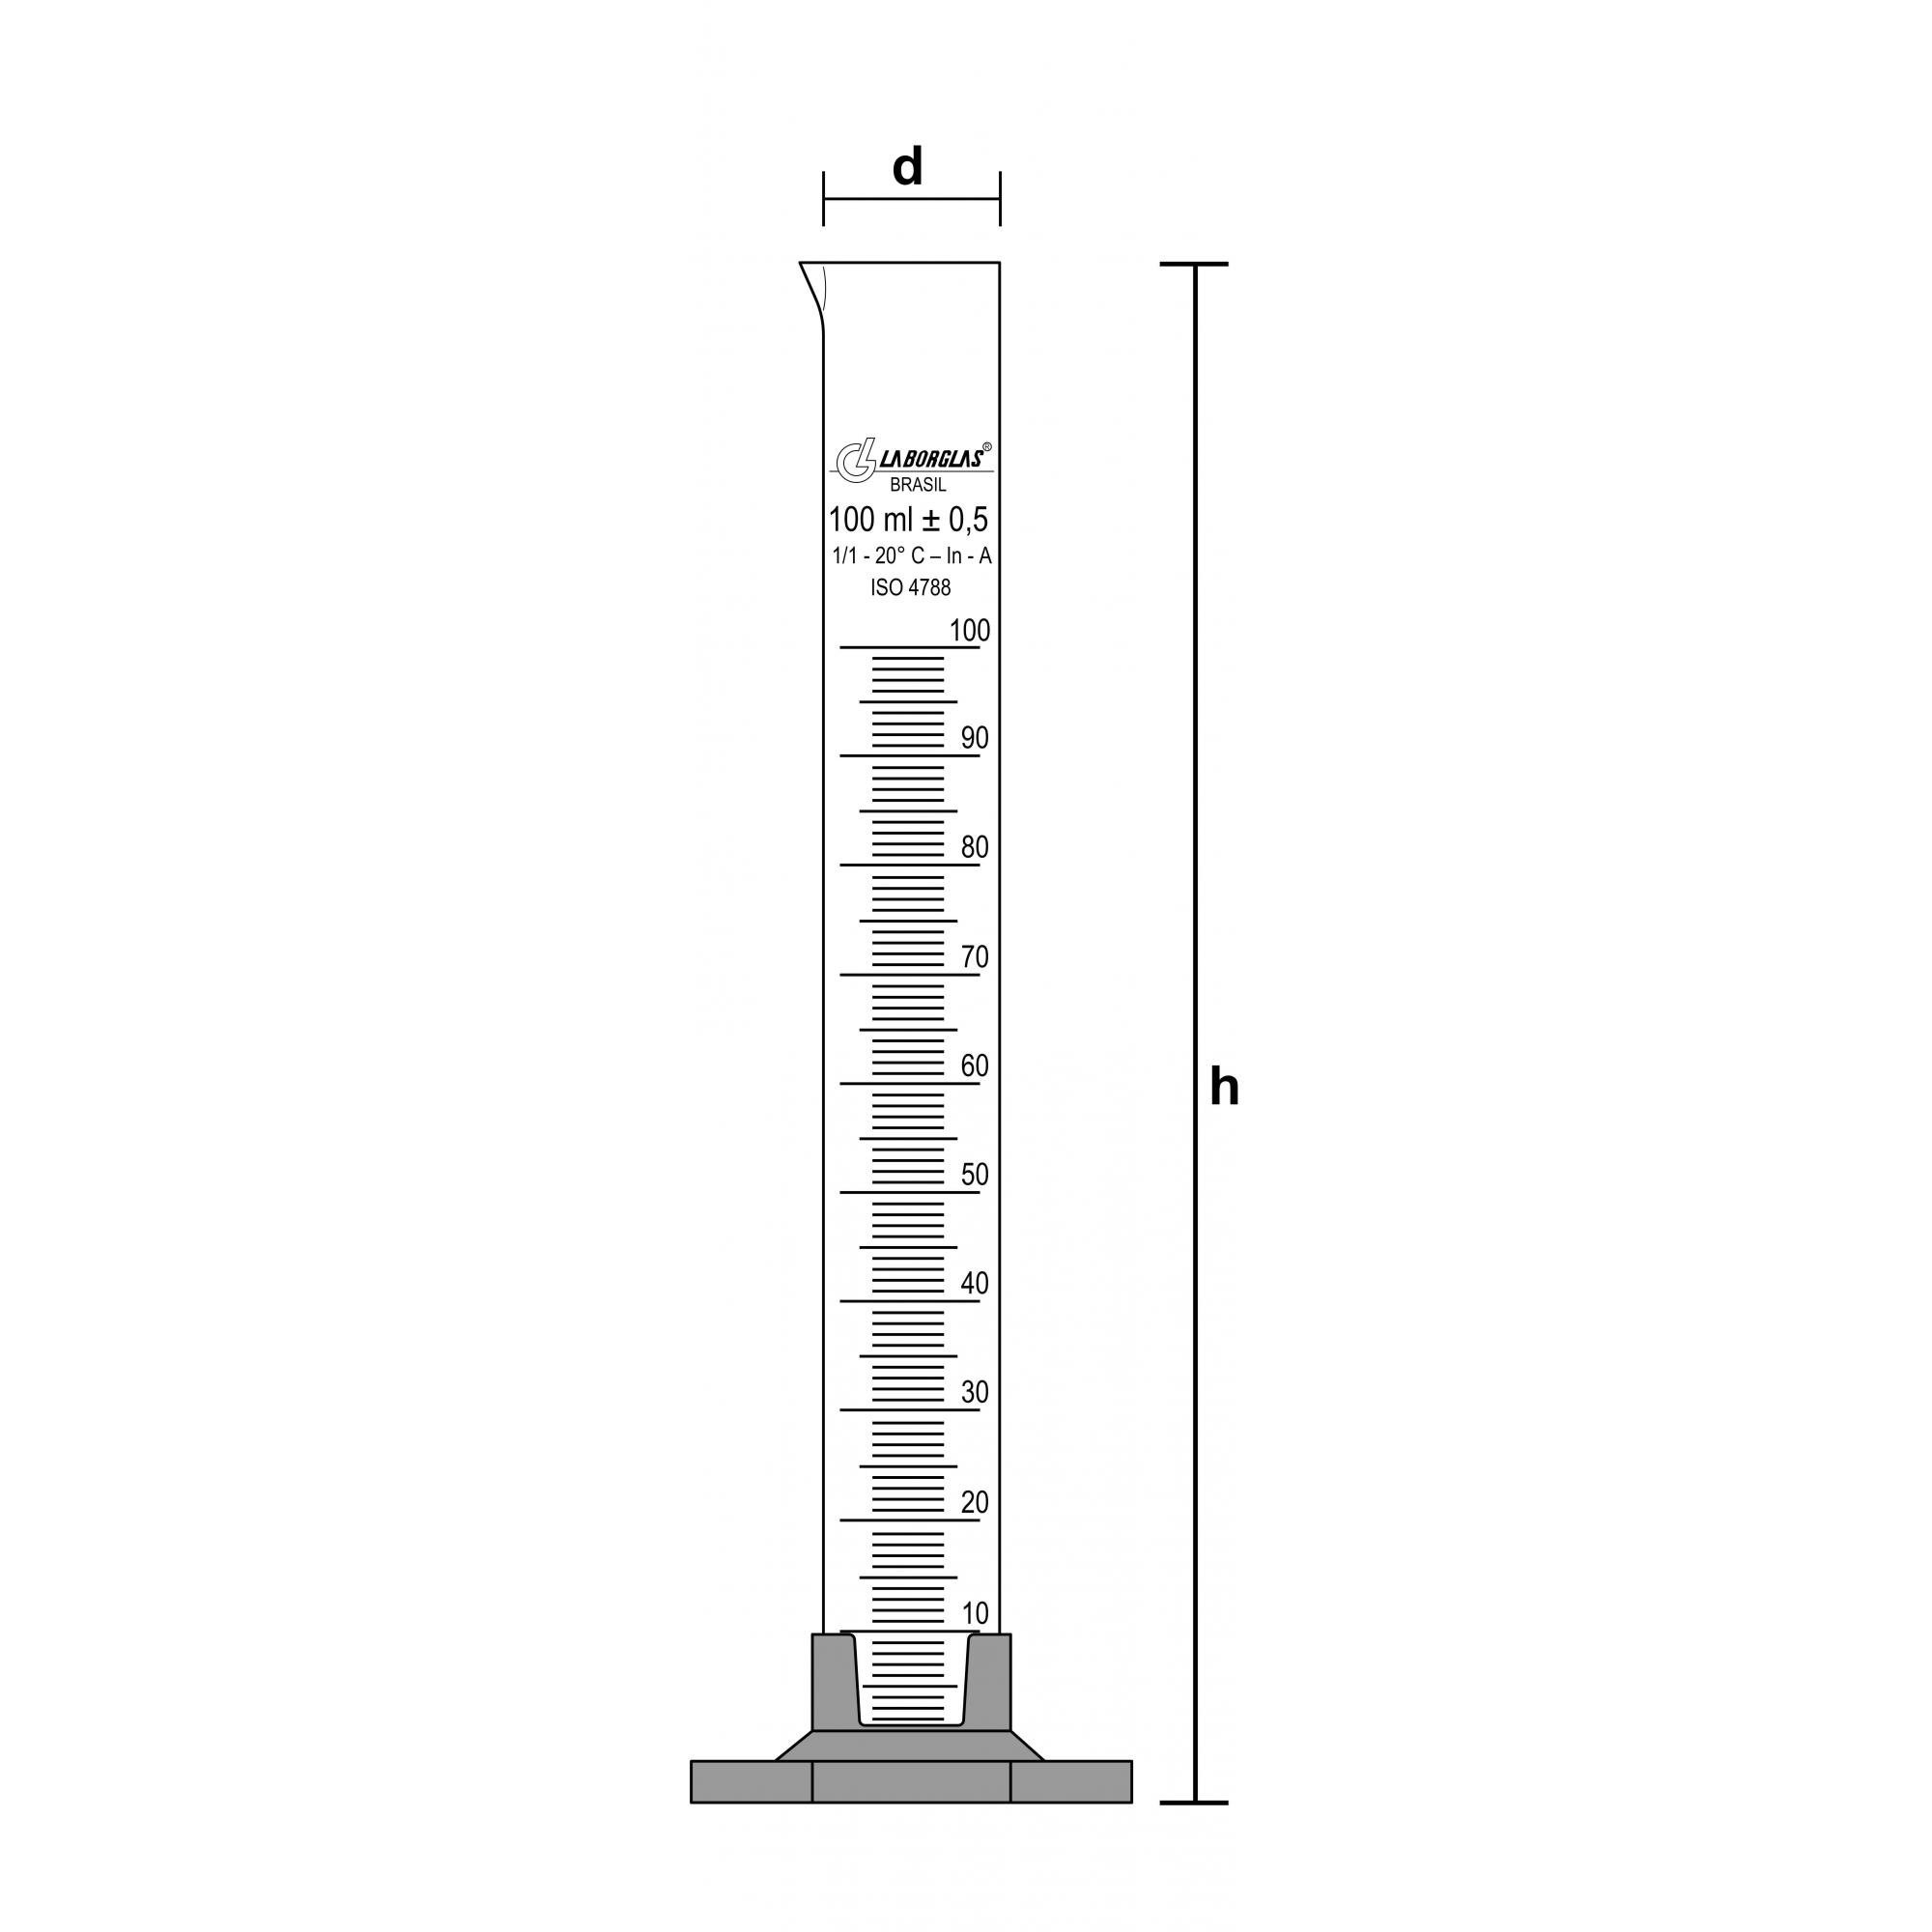 PROVETA GRADUADA BASE HEXAGONAL DE POLIPROPILENO CLASSE A 10 ML - Laborglas - Cód. 9138708